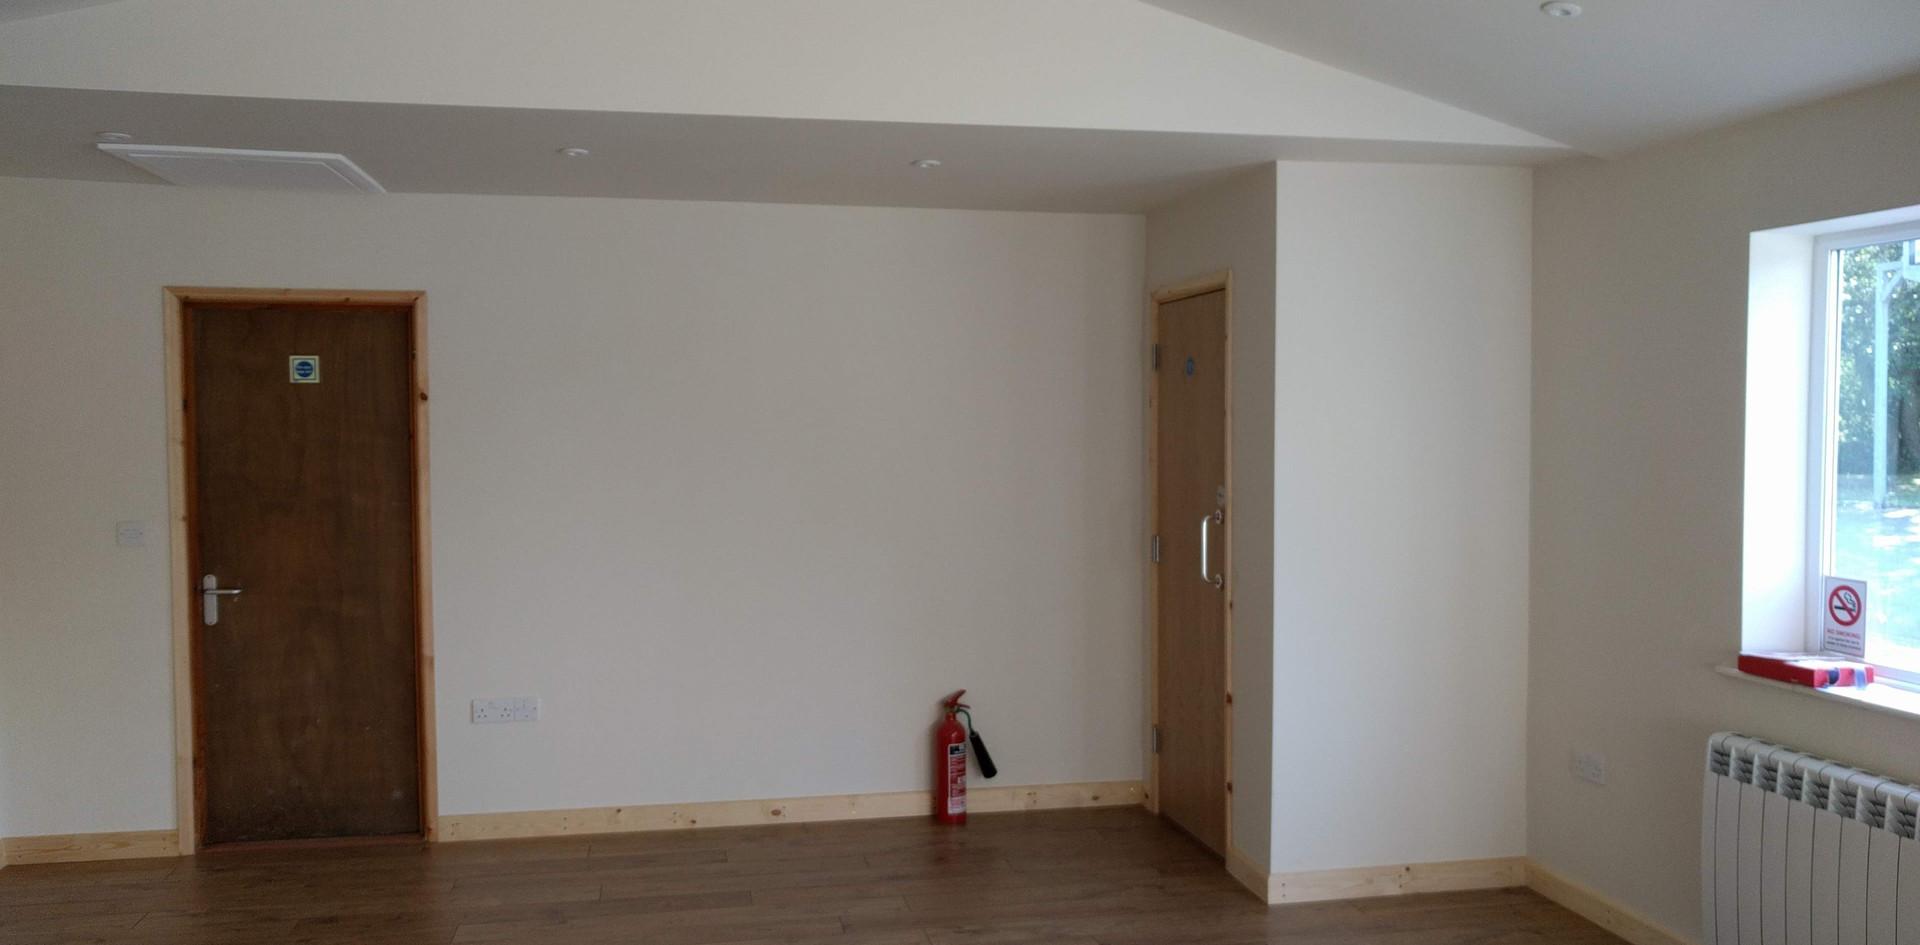 Smaller tidier cupboard